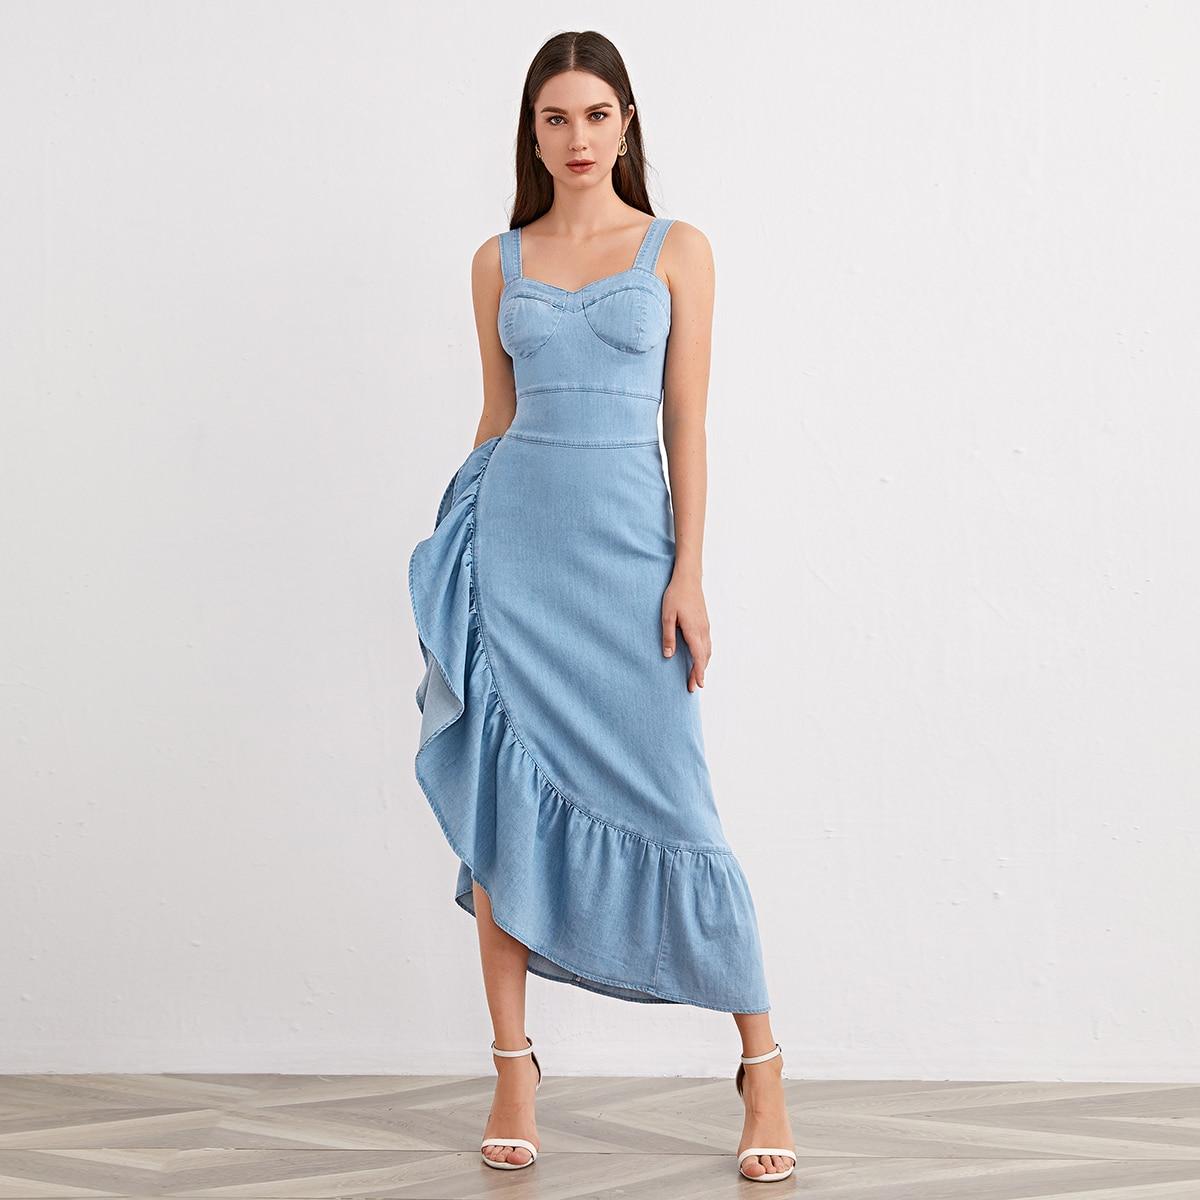 shein Casual Vlak Denim jurk Rimpeling